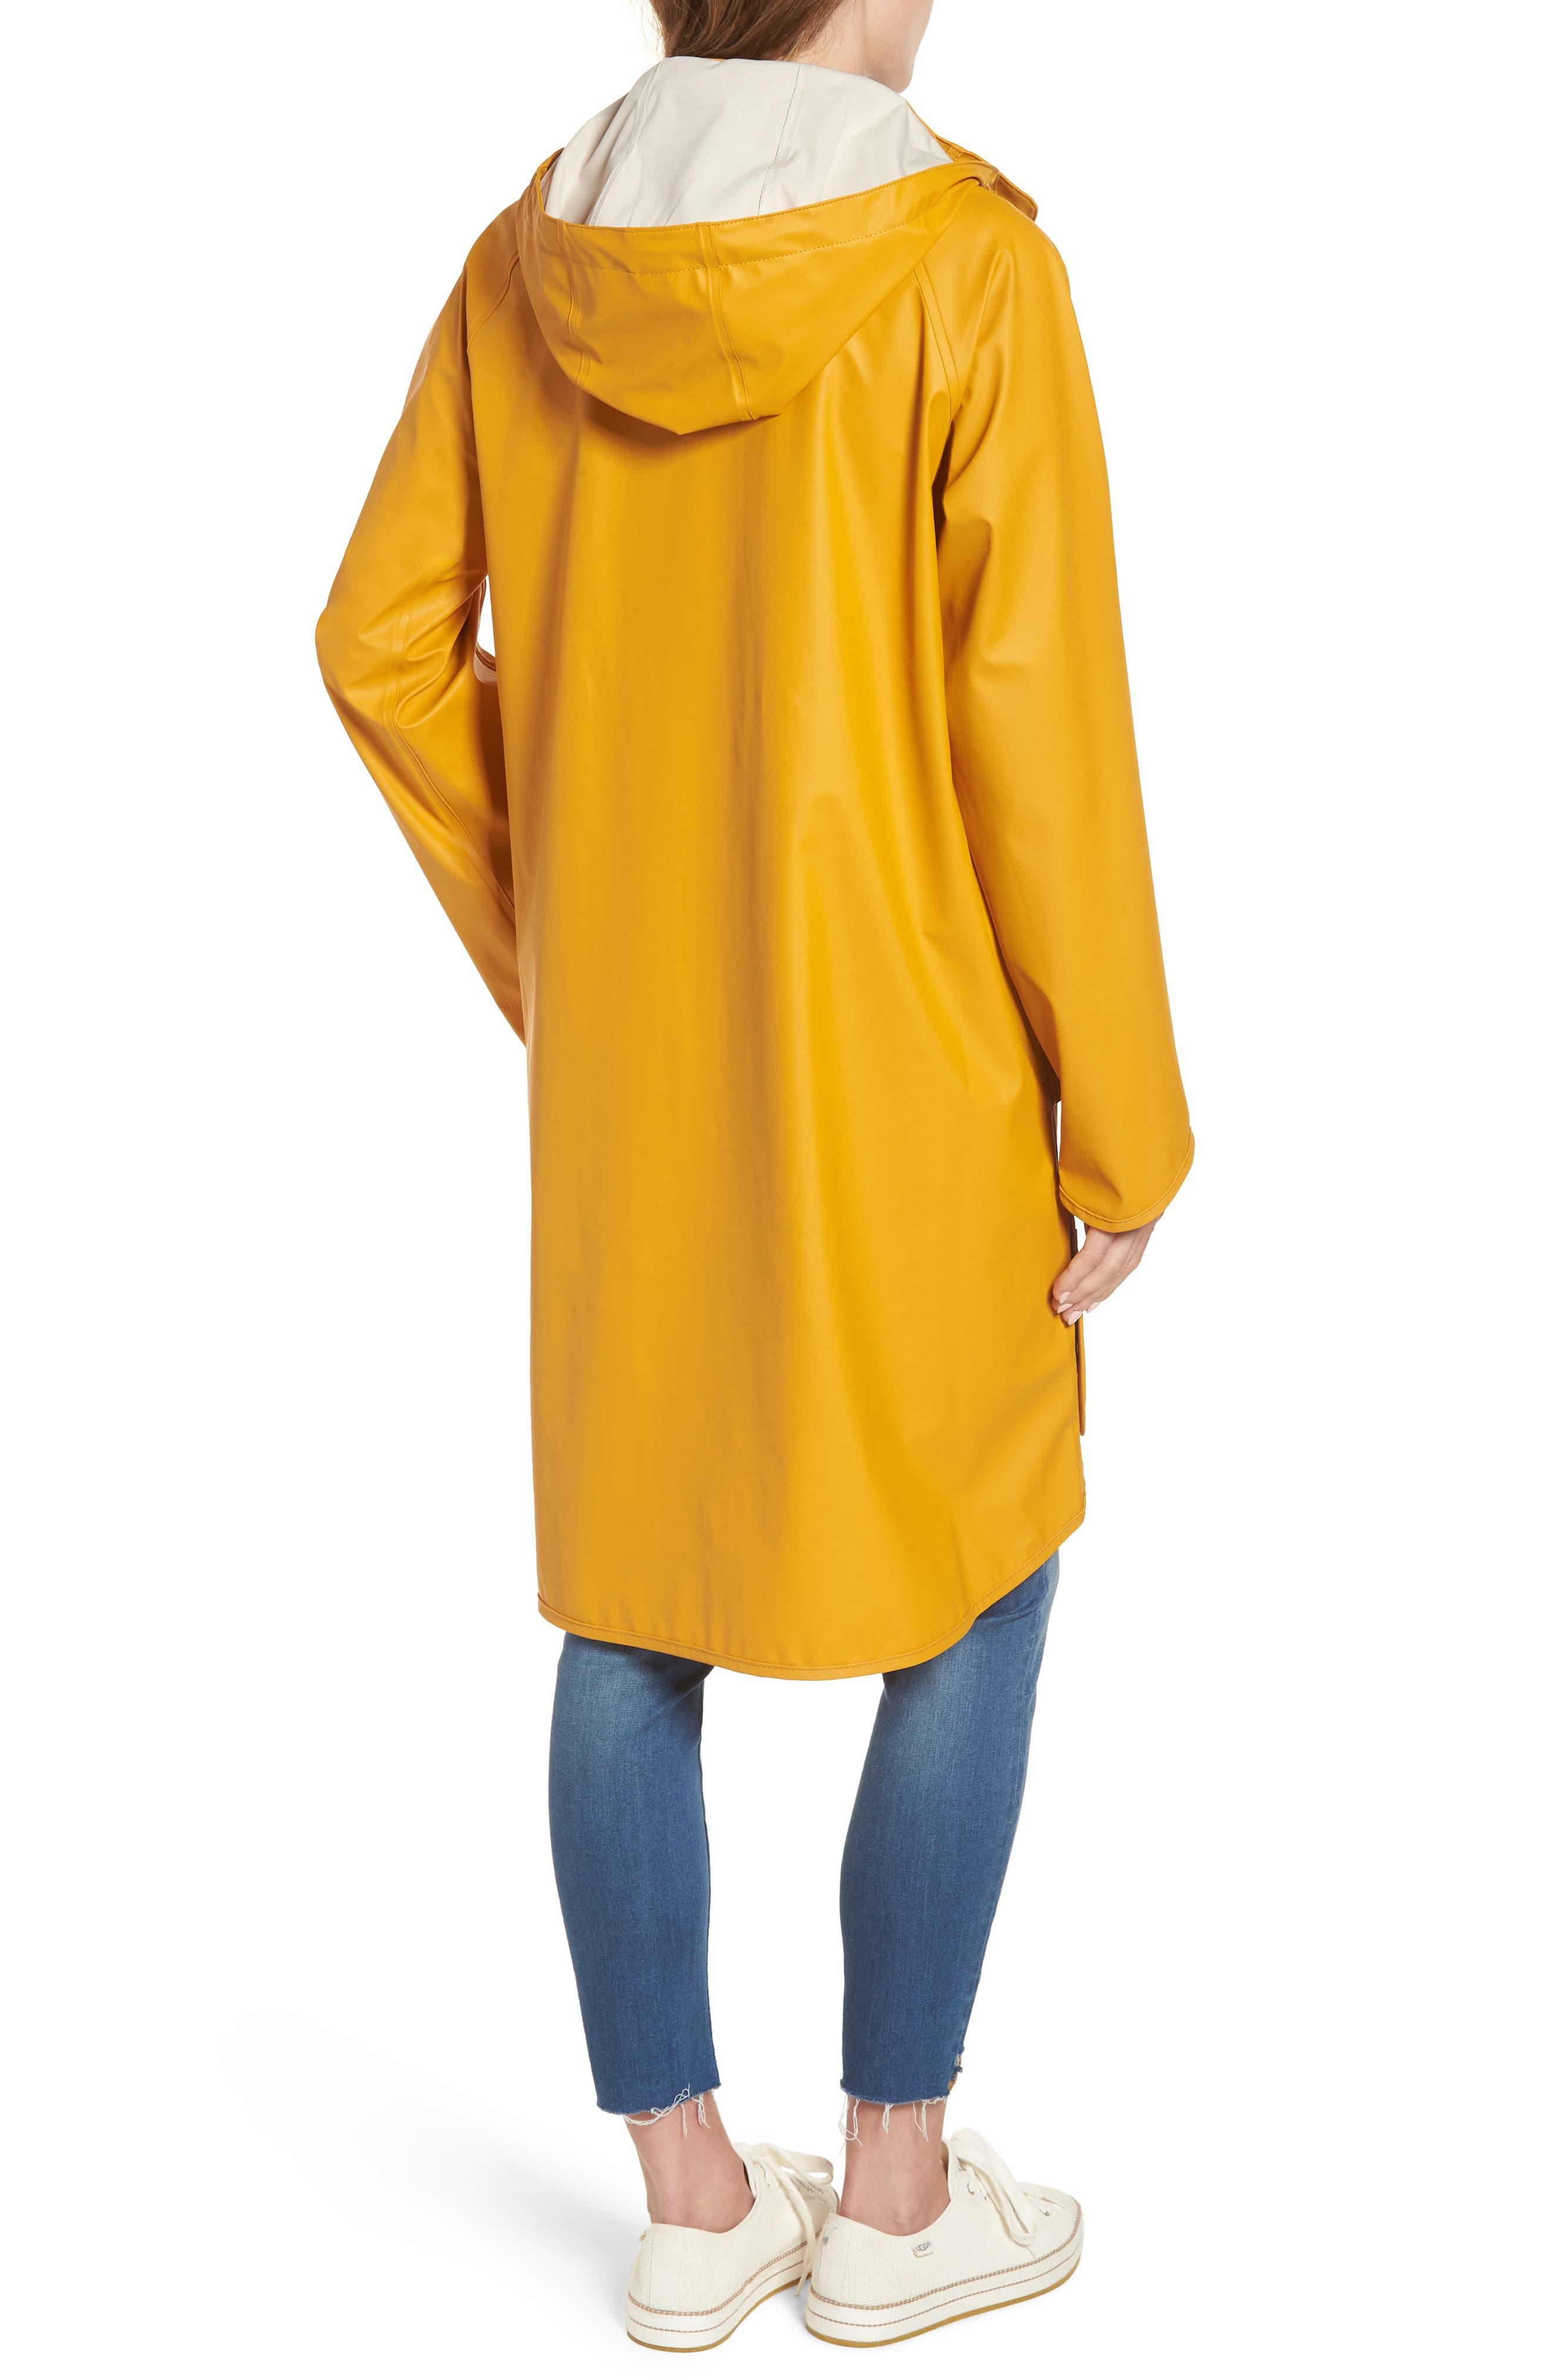 Rain Slicker,                             Alternate thumbnail 2, color,                             Golden Yellow